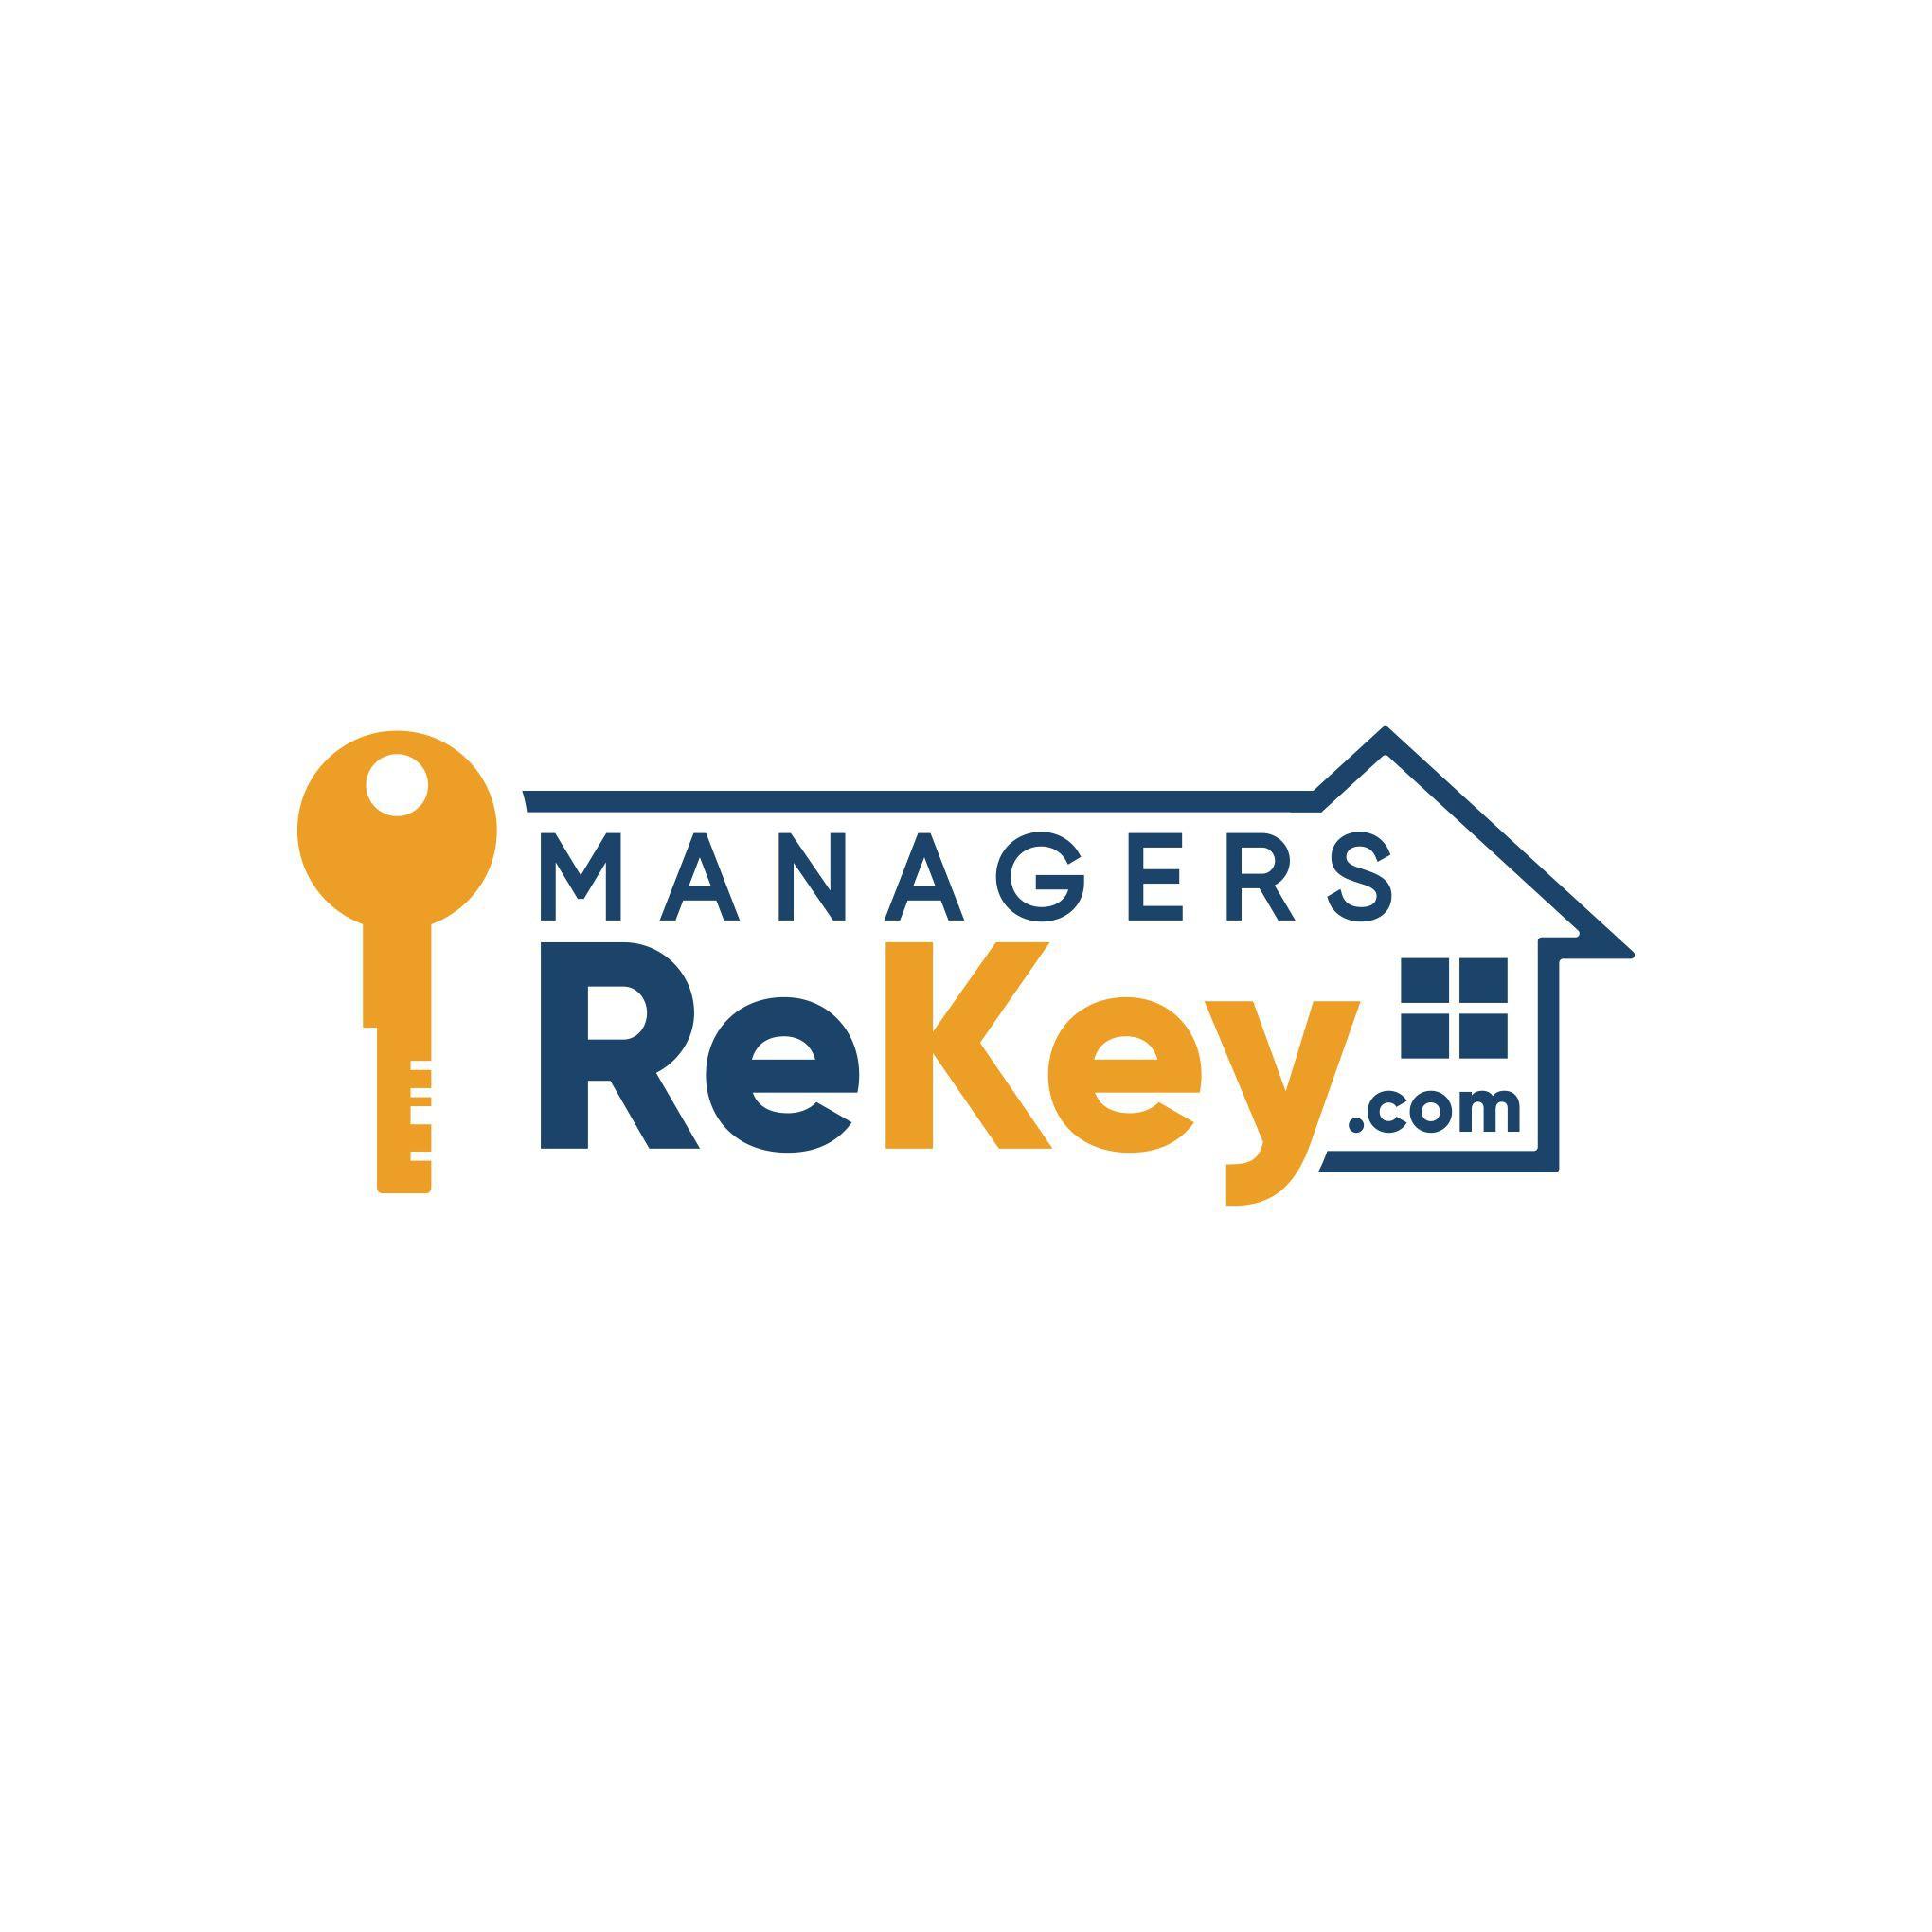 Locksmith company for Property Managers Needs a Distinct Logo